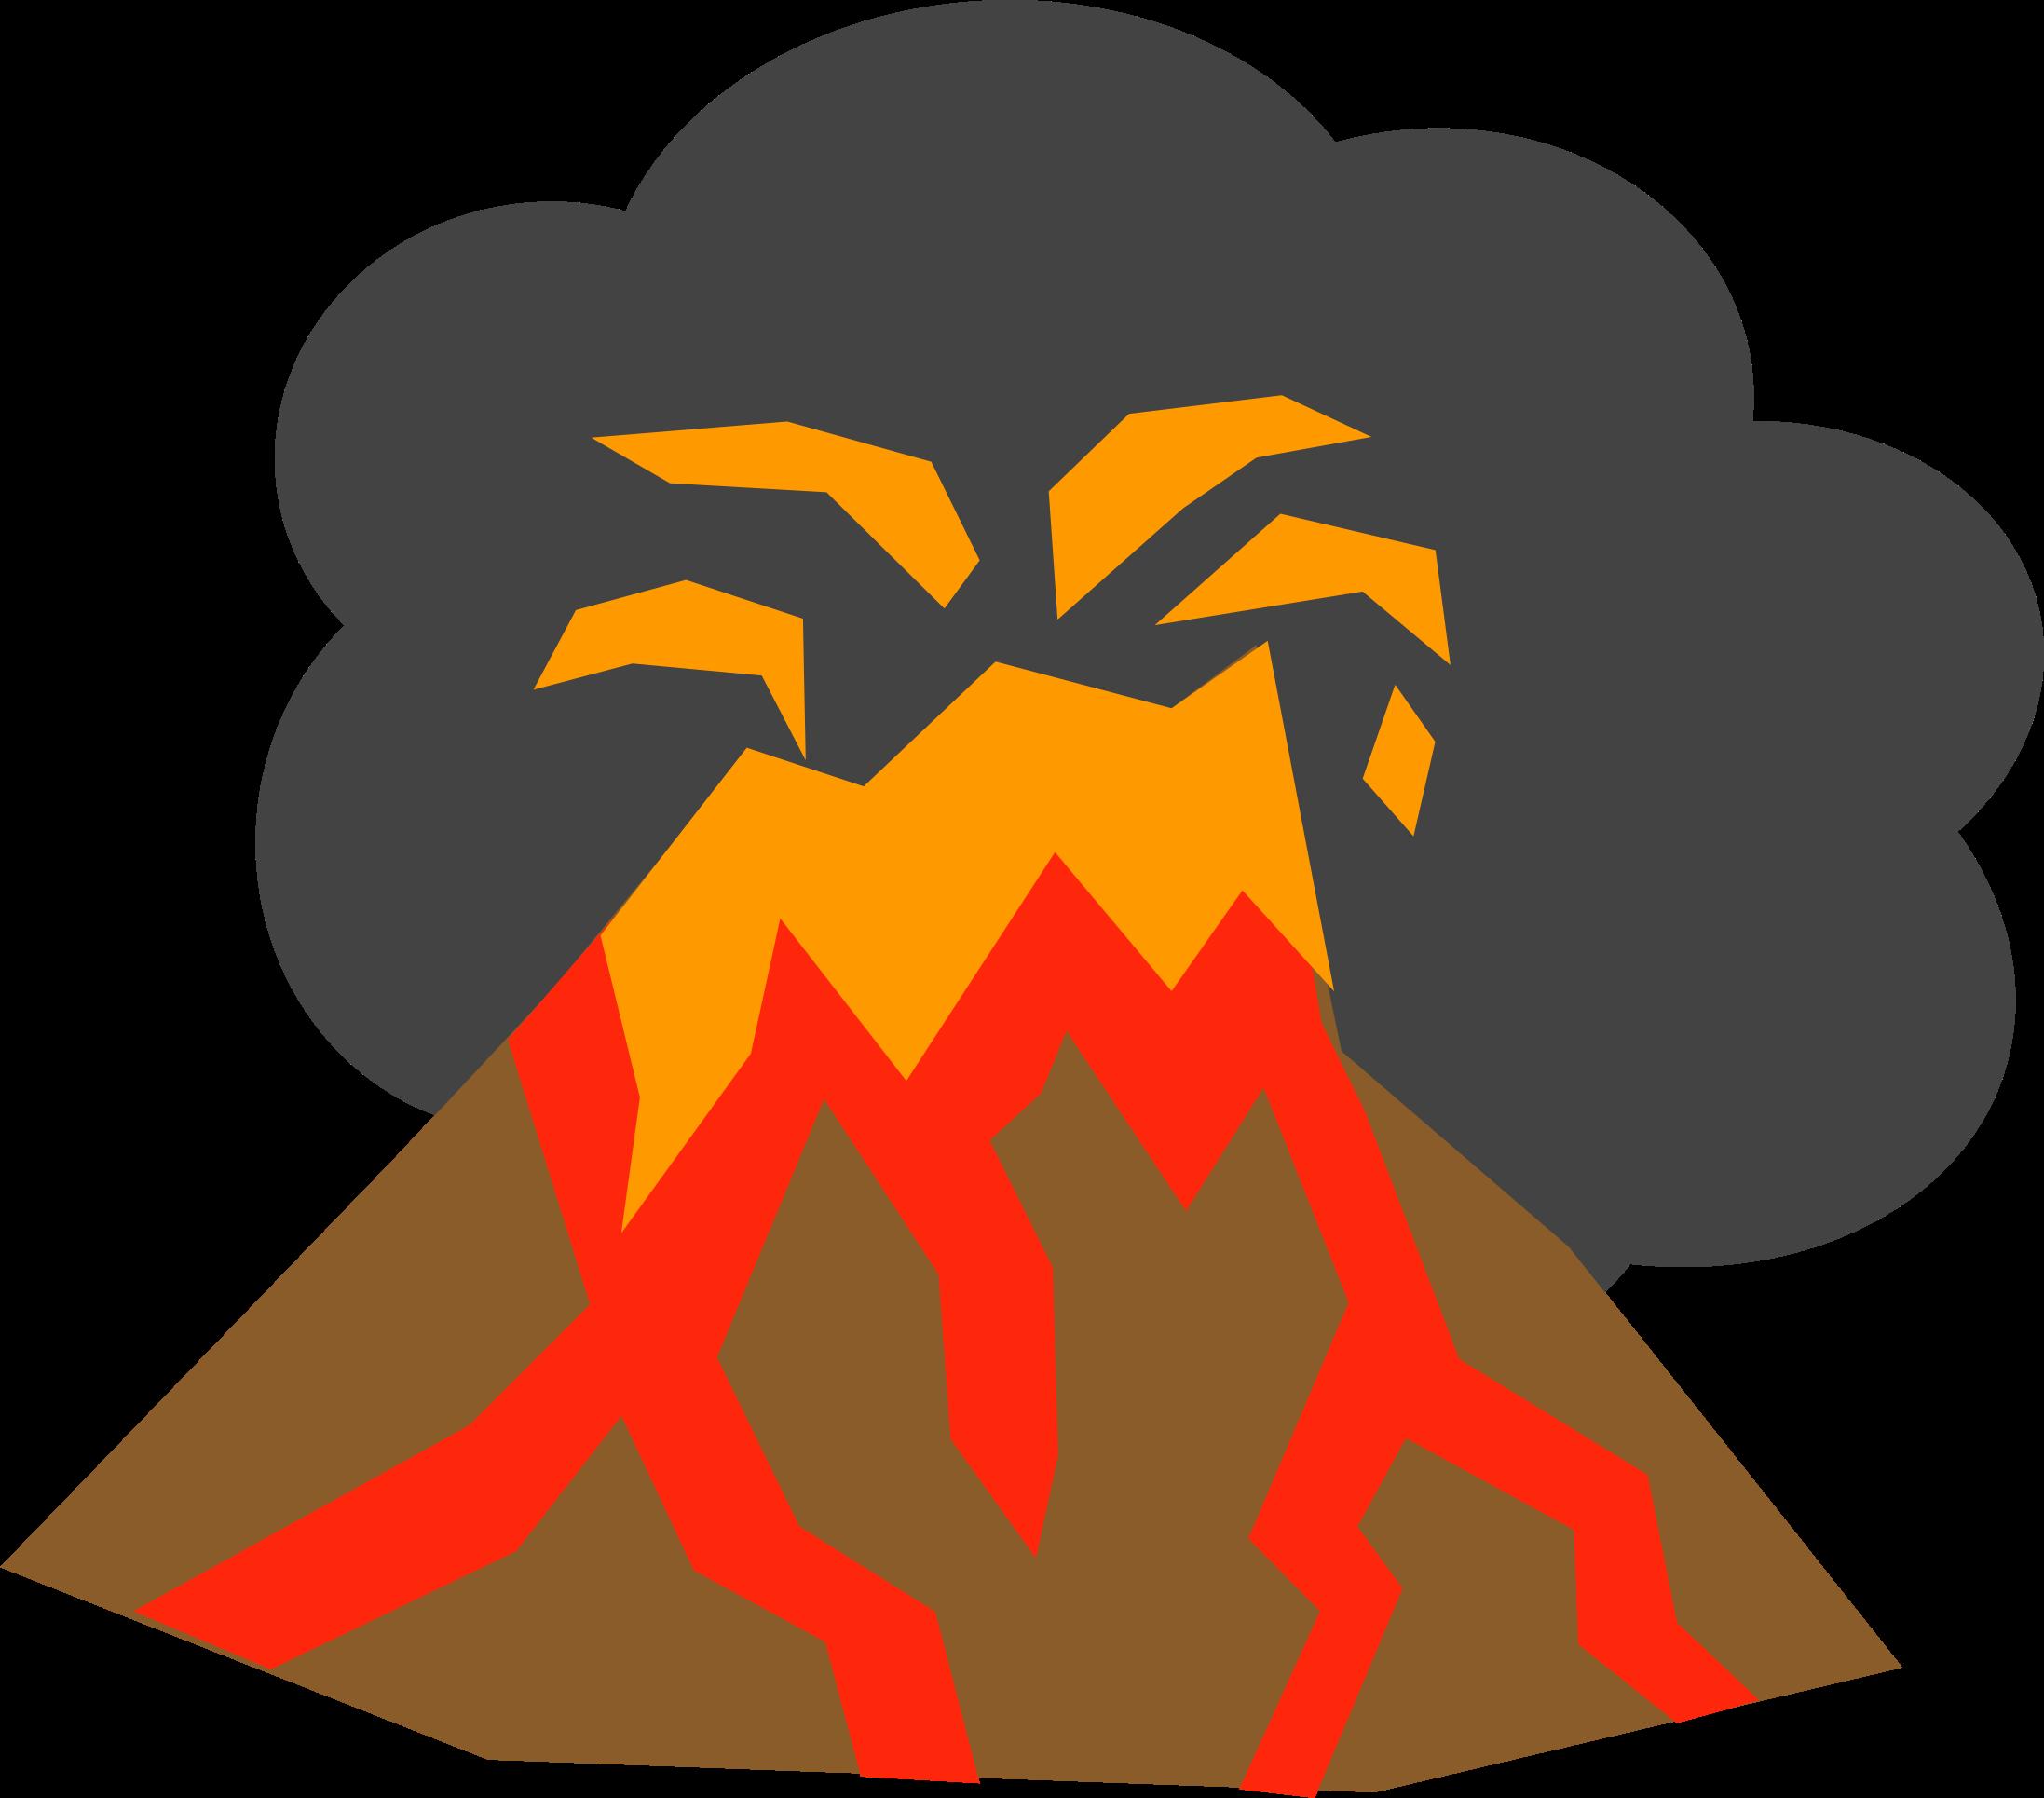 Disaster clipart volcano lava Volcano Volcano Clipart